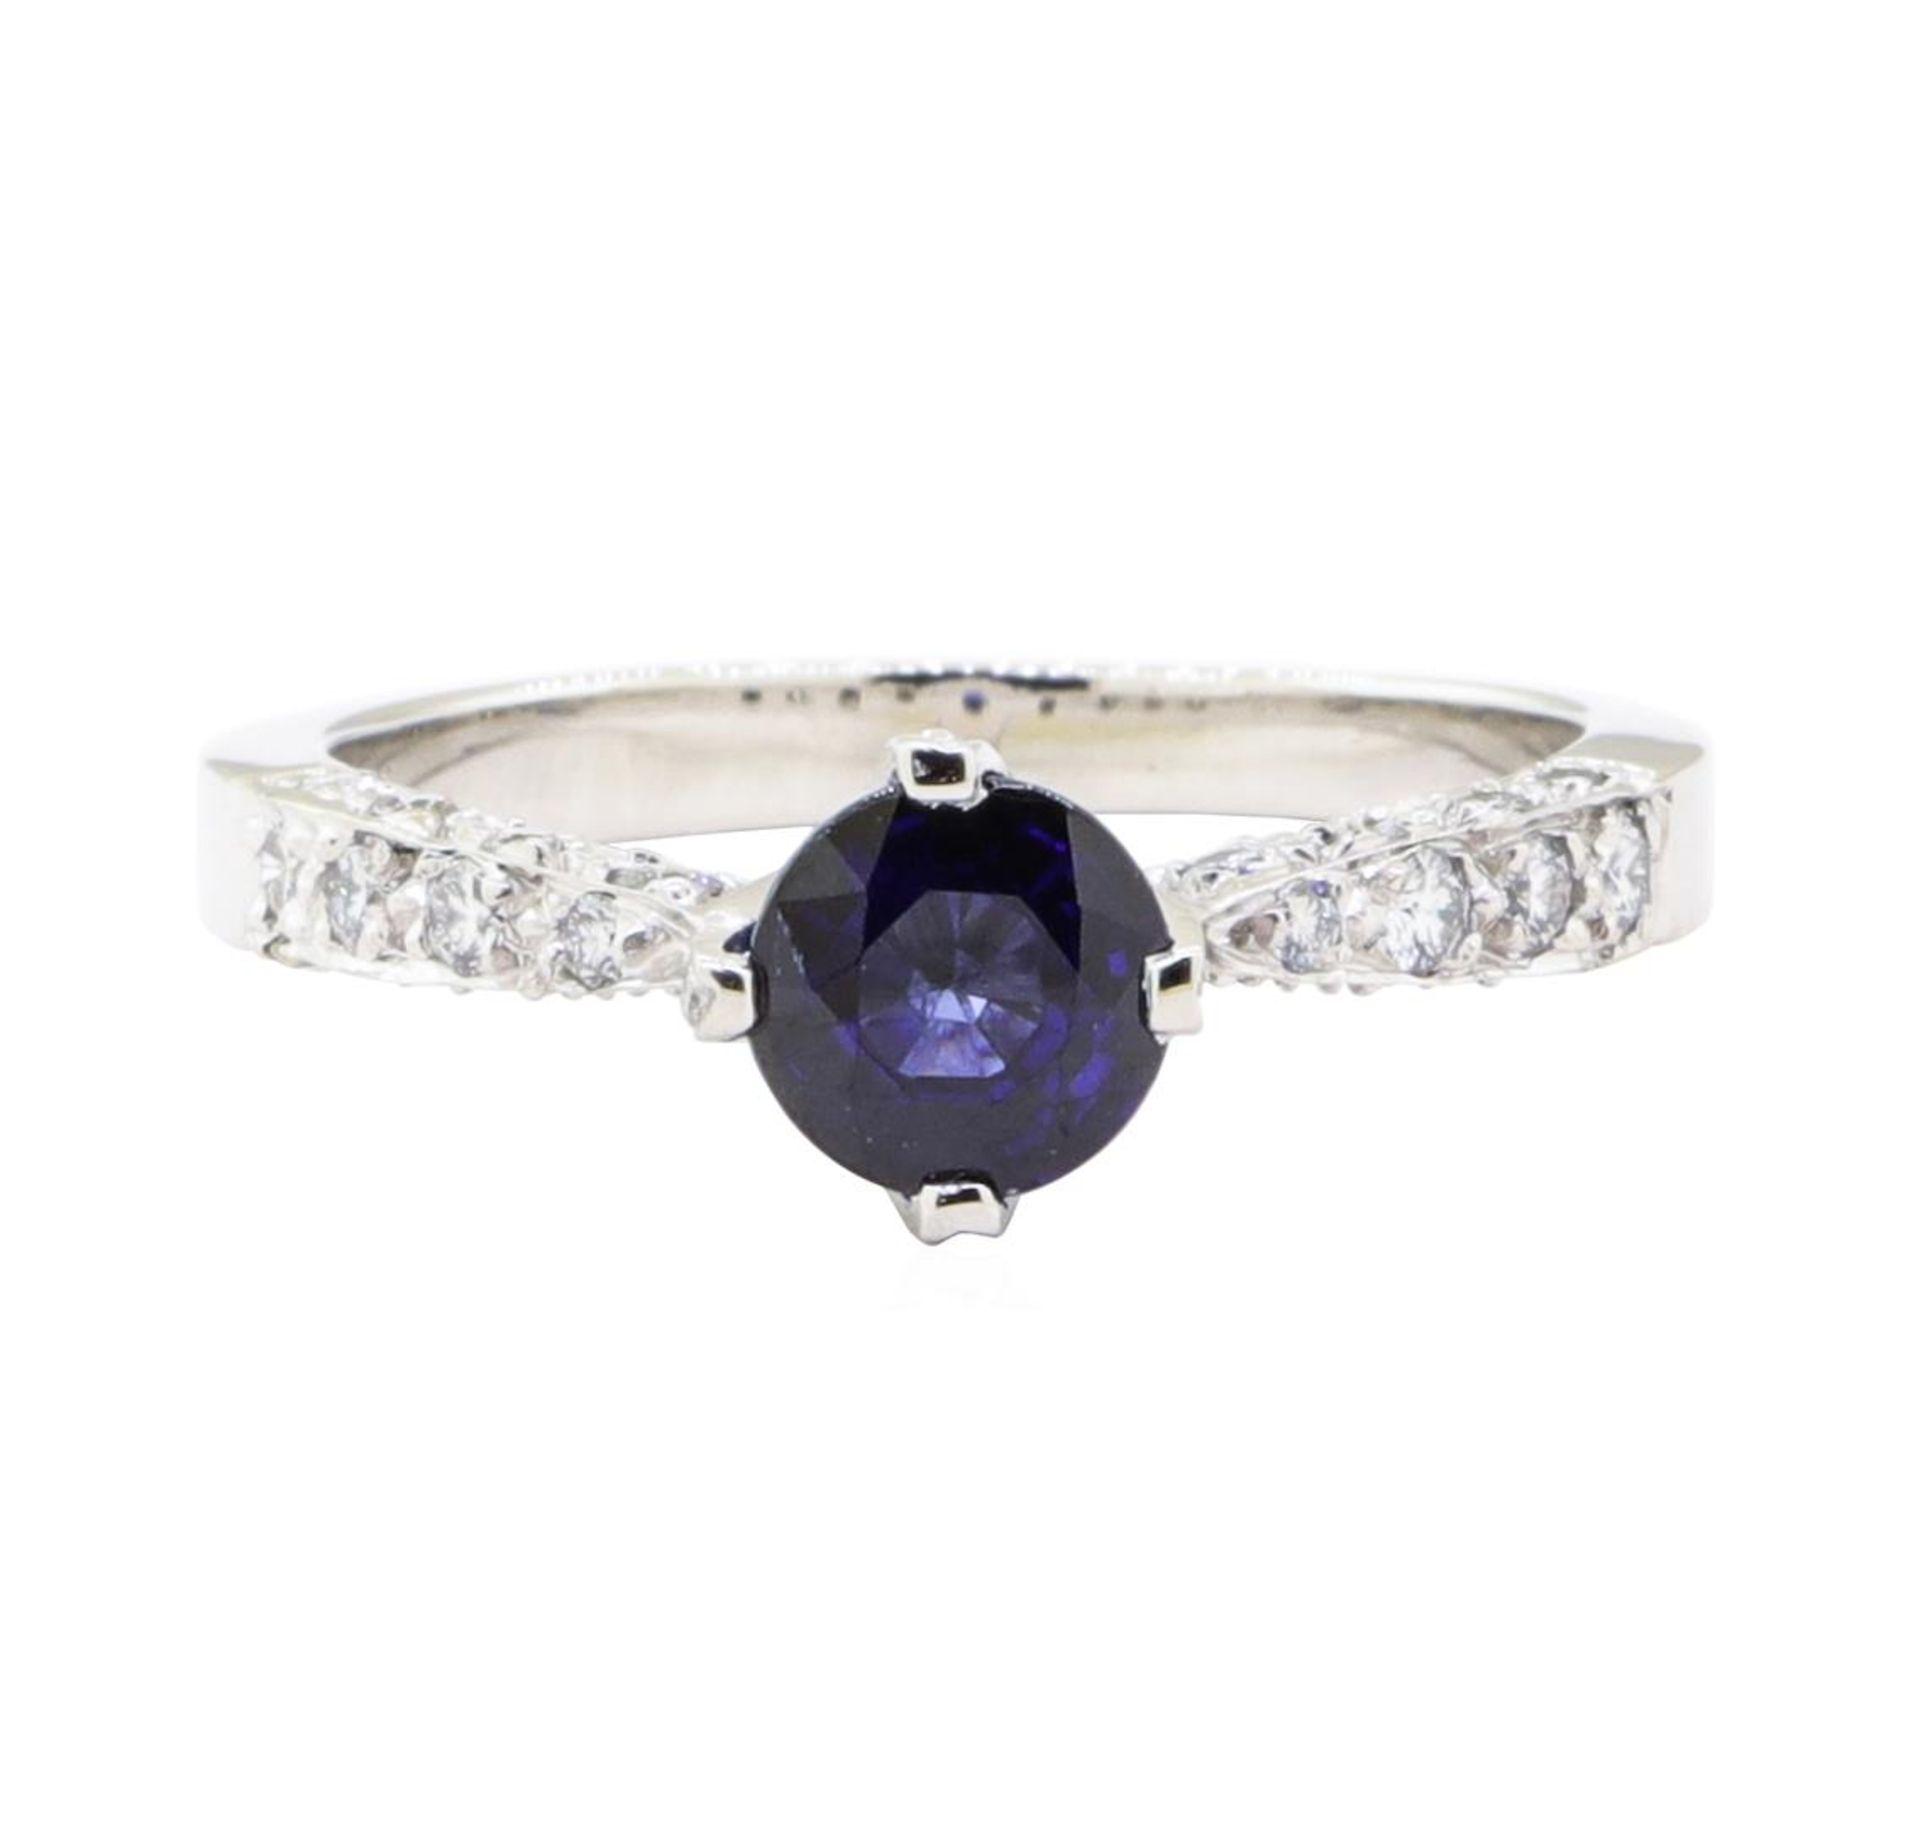 1.69 ctw Sapphire And Diamond Ring - Platinum - Image 2 of 5